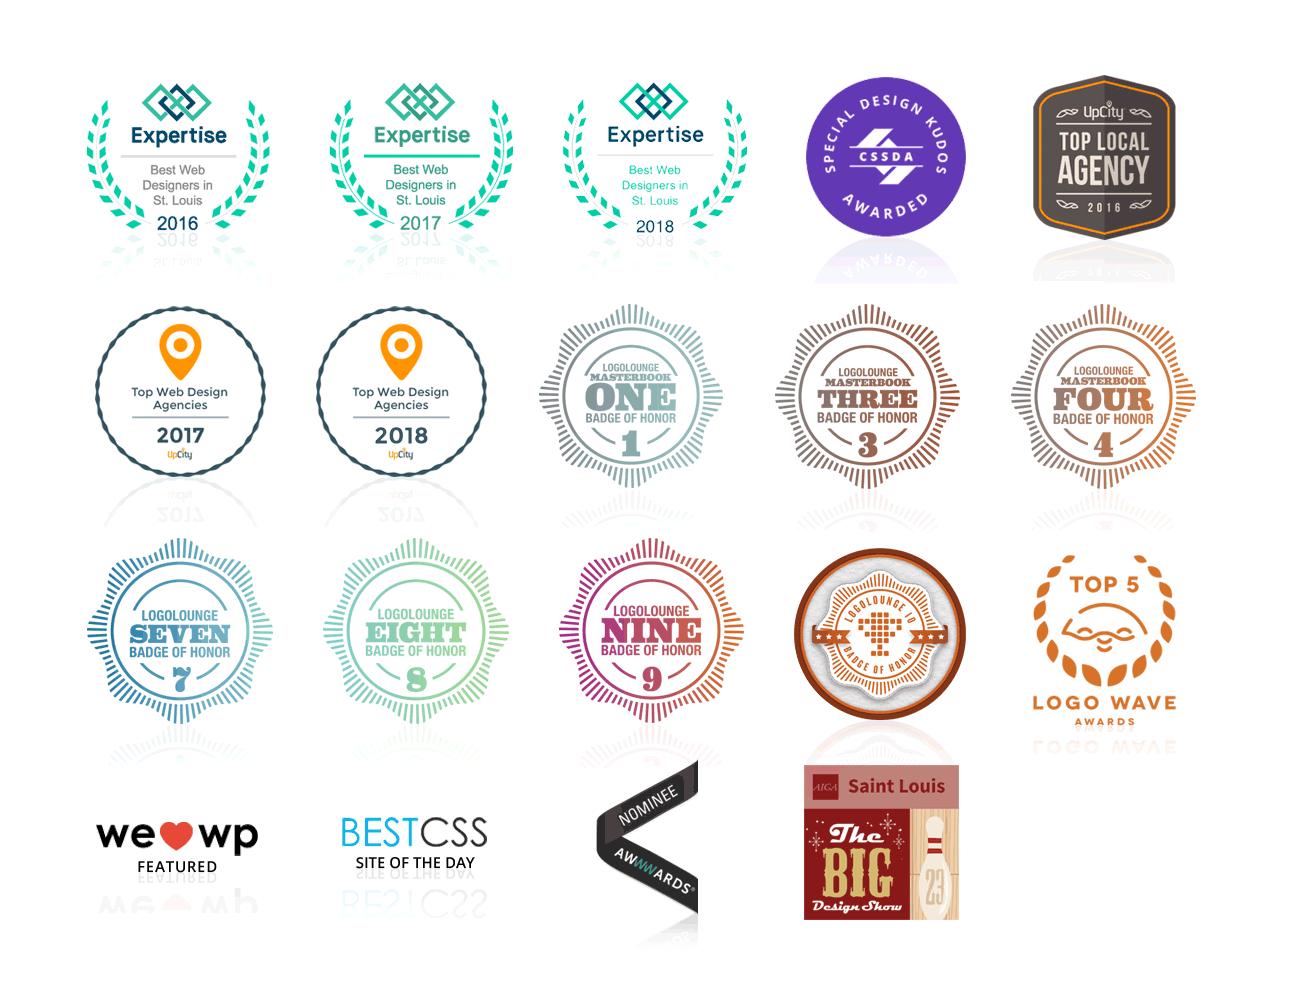 Visual Lure design honors & awards